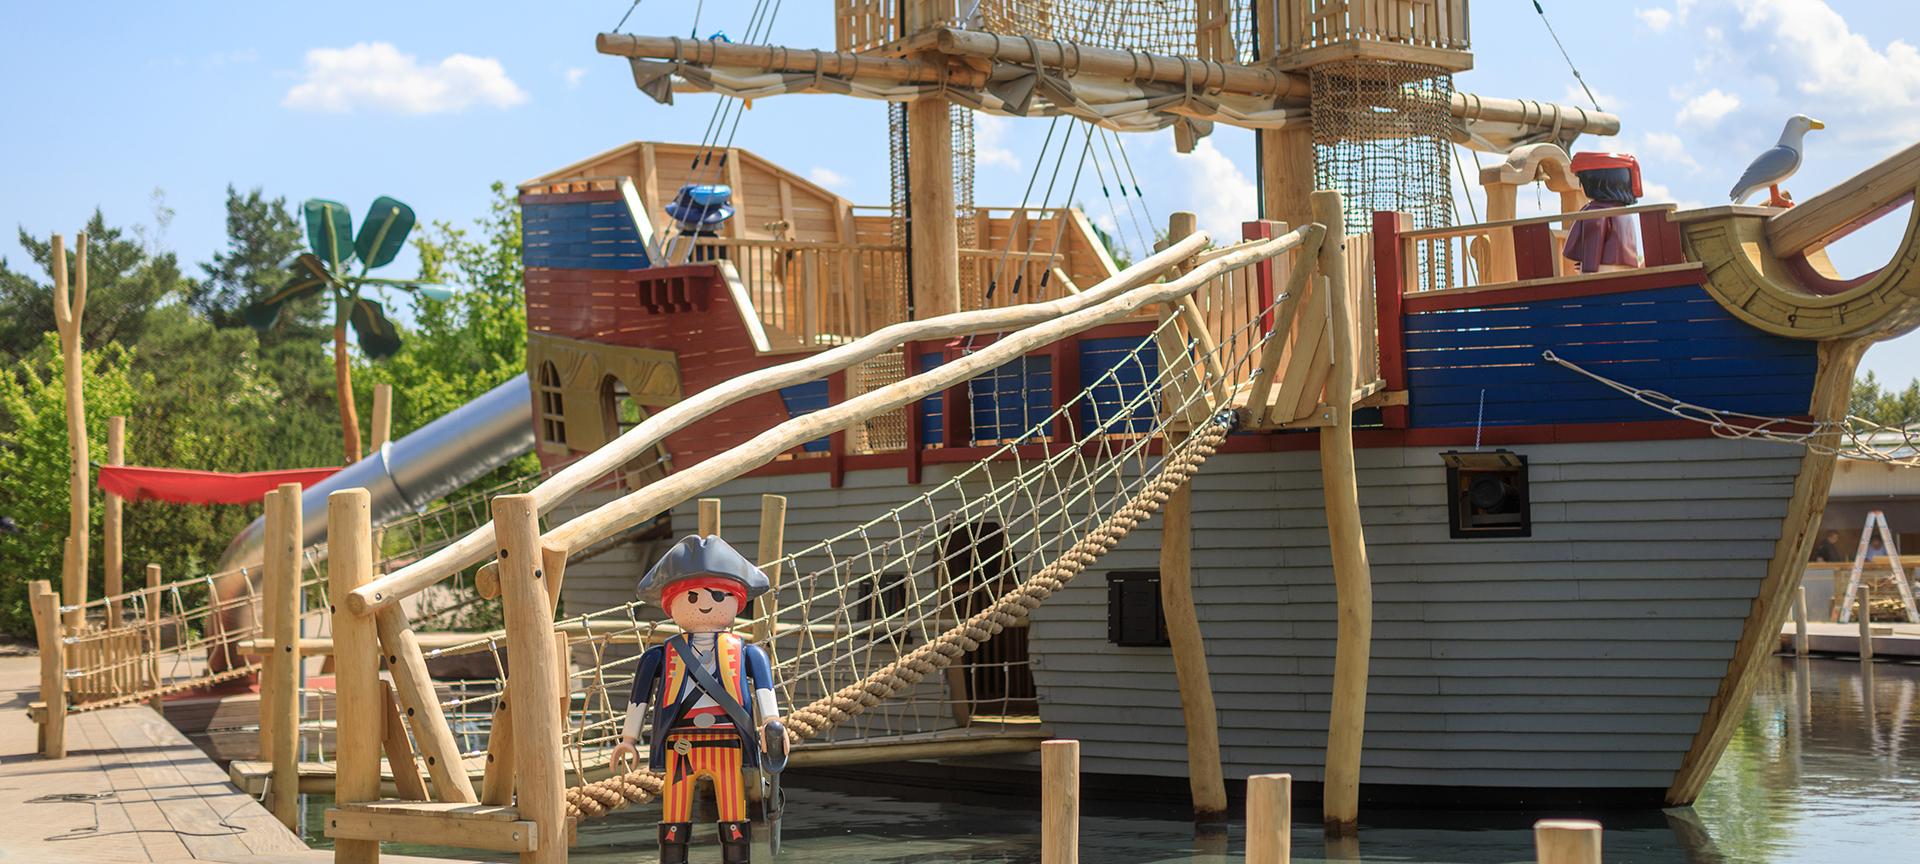 Playmobil Funpark pirate ship